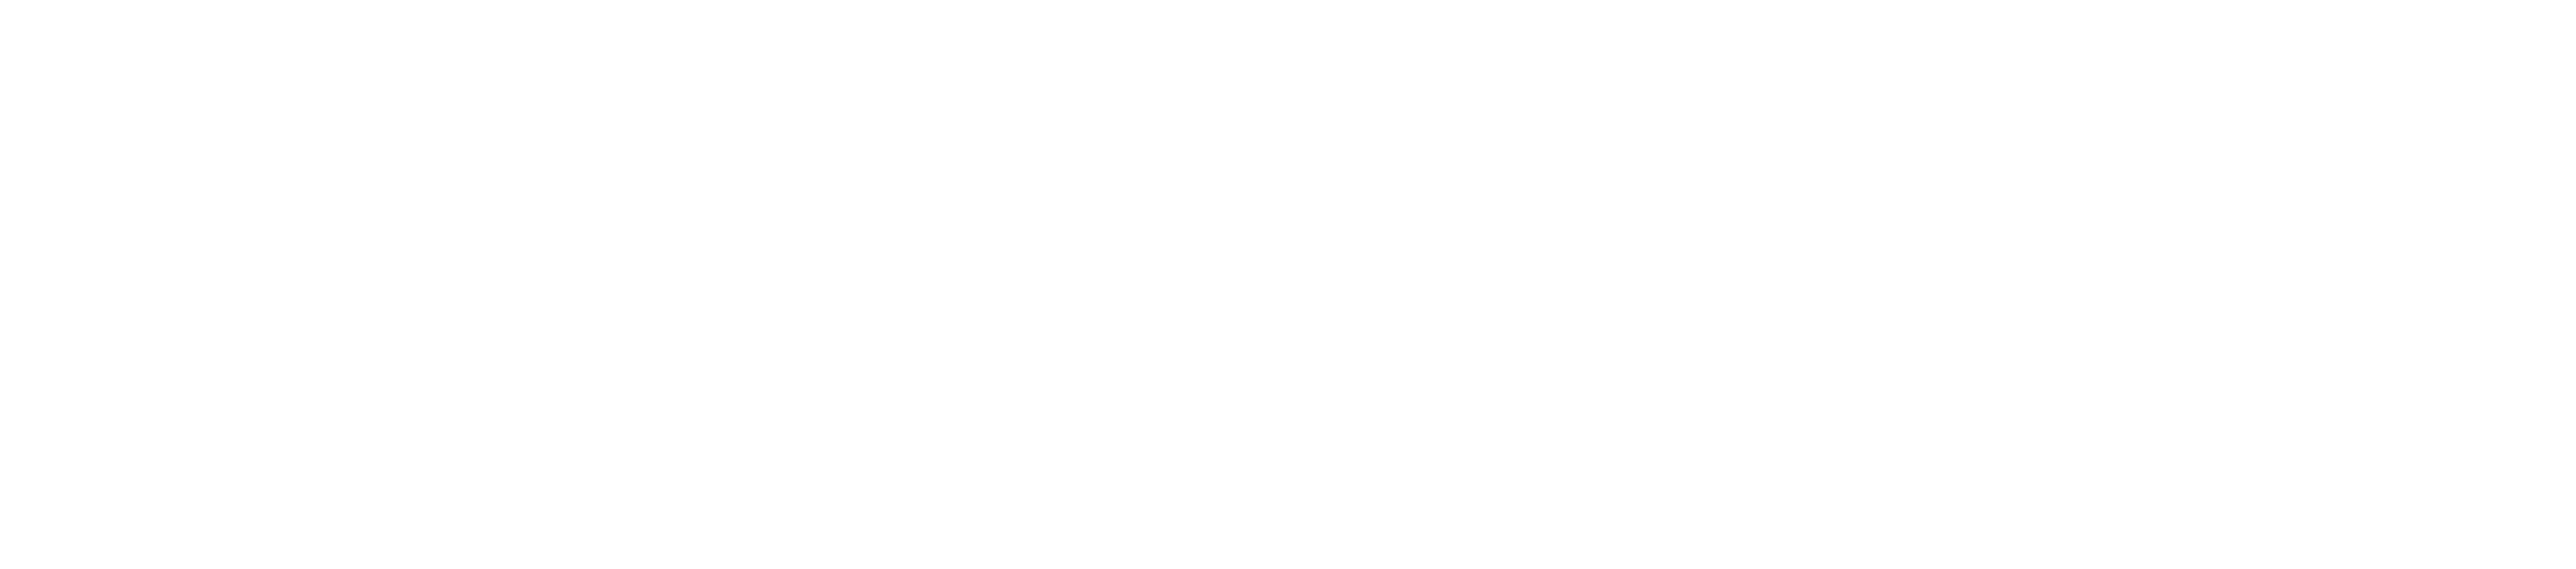 ShakeShack_logo_White_Text